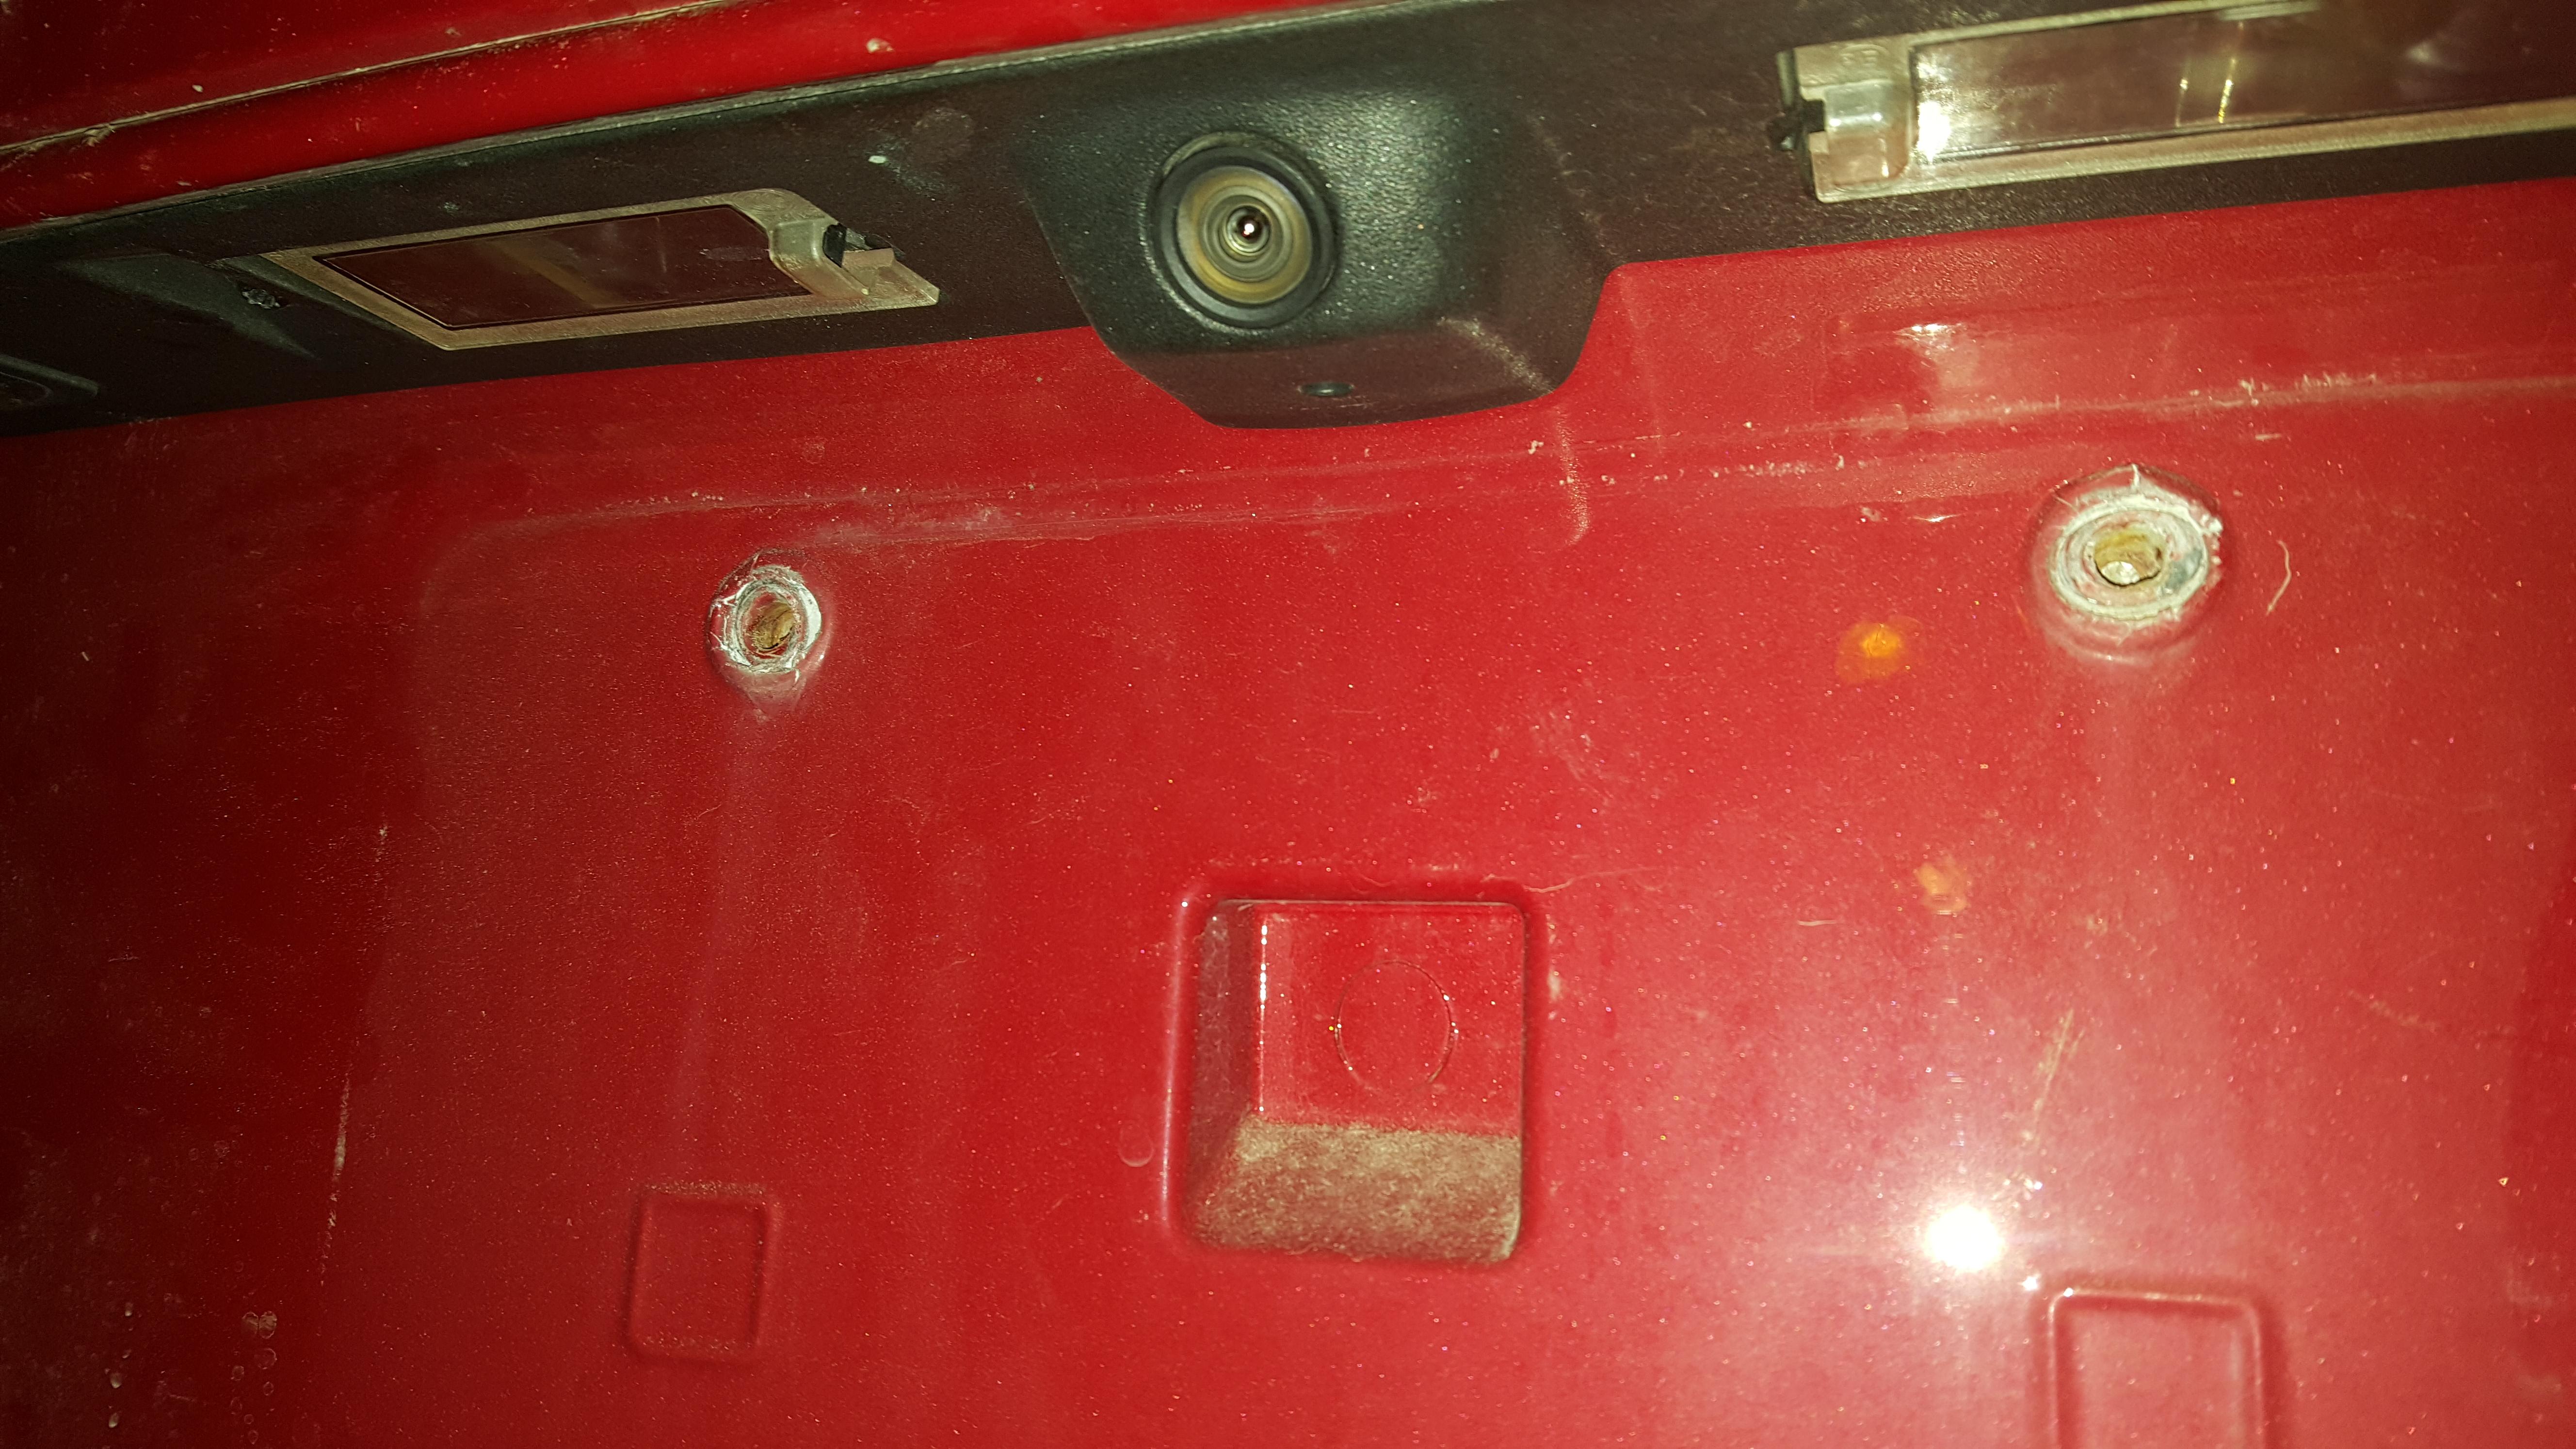 Rear License Plate Fix? - Accessories, Modifications - Dodge Journey Forum